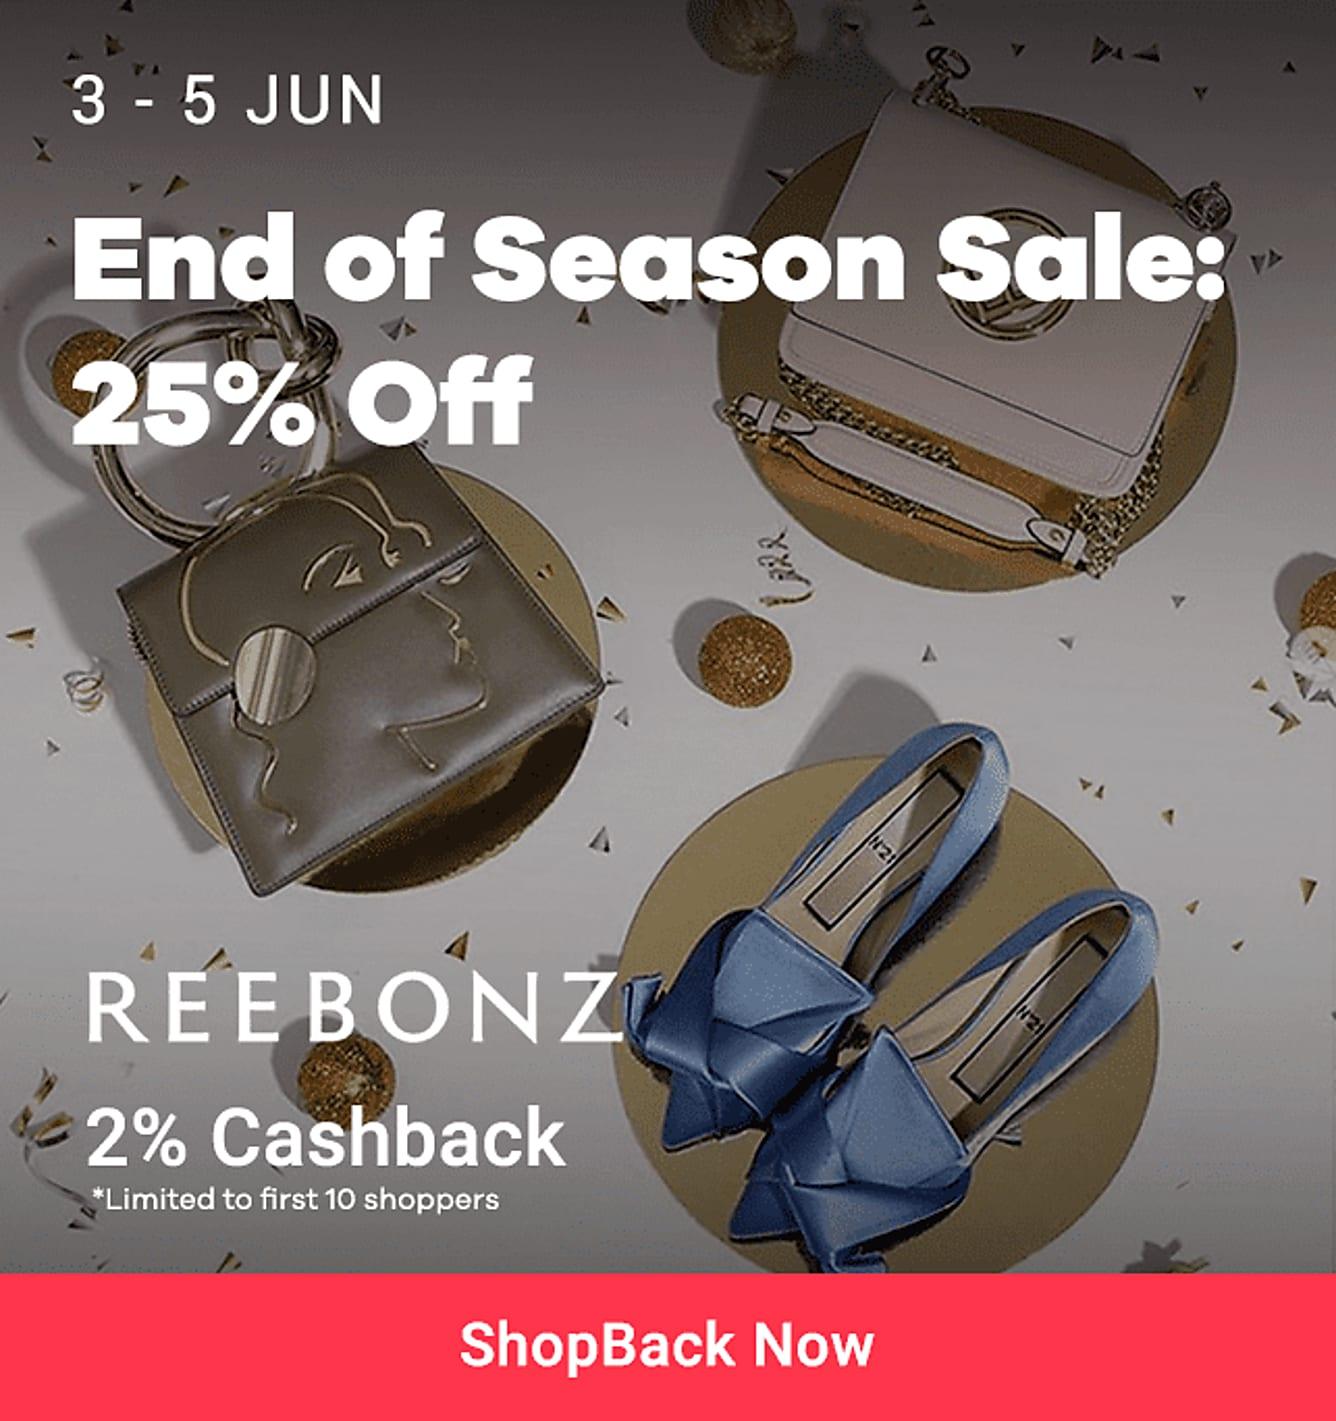 Reebonz_Onsite_3 June-5 June 2020